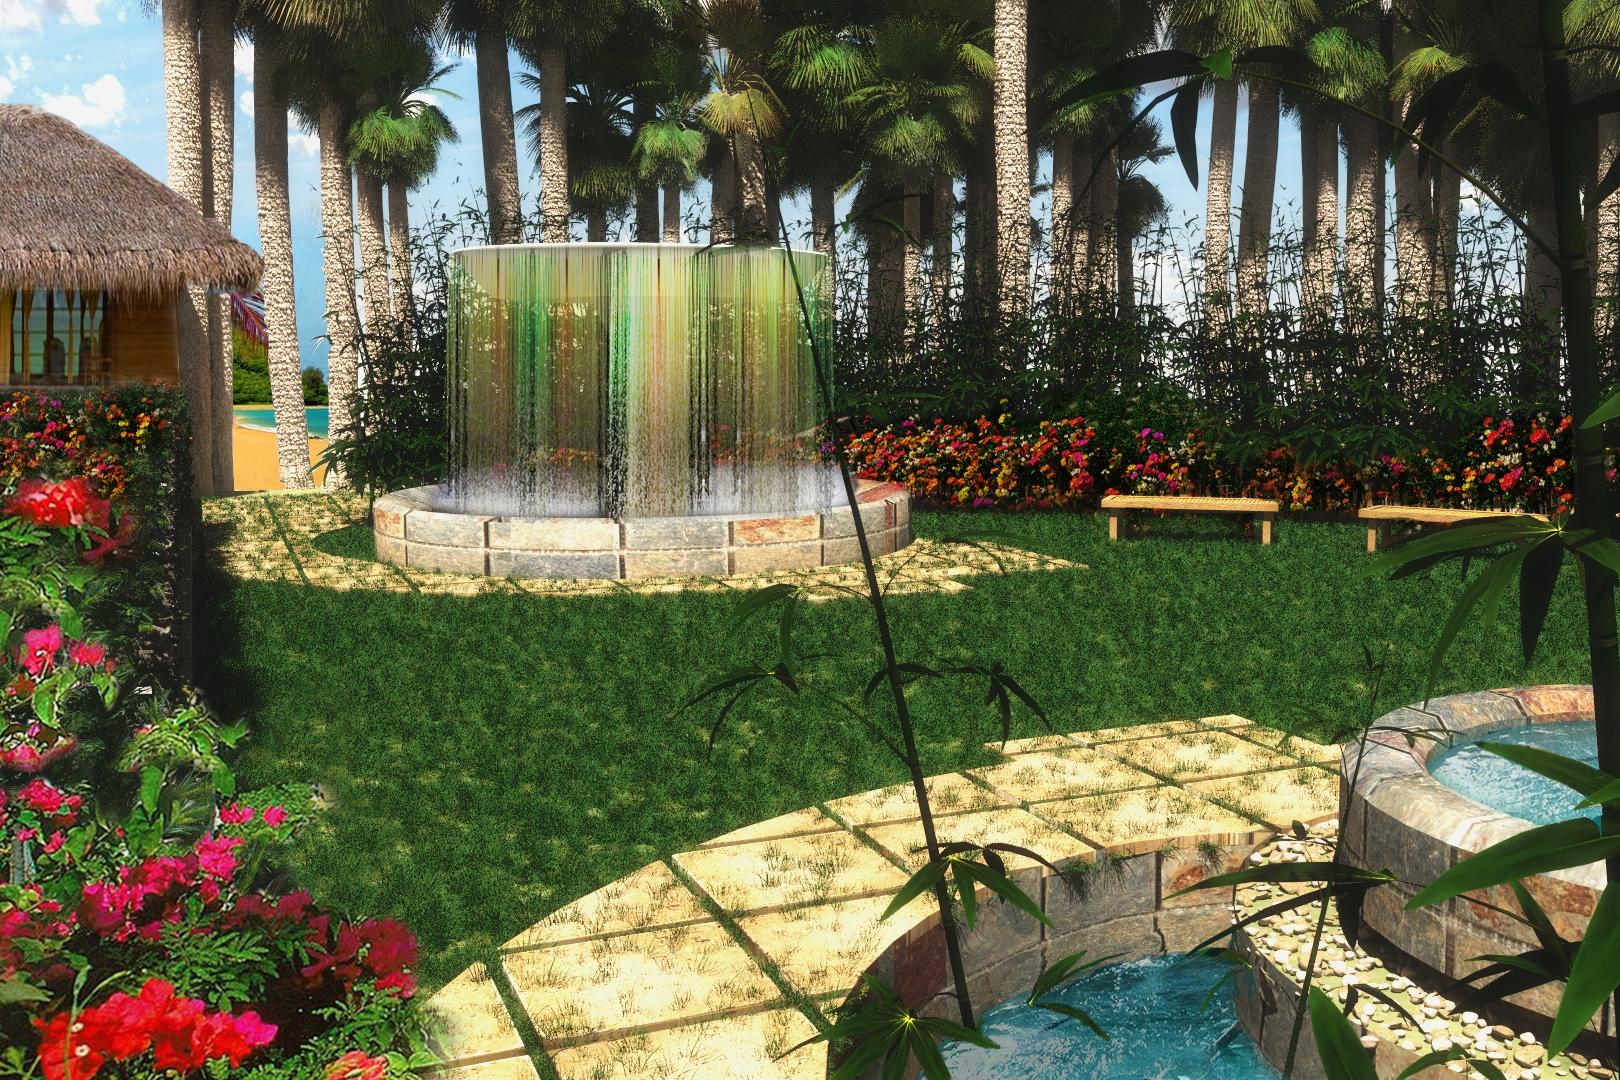 Serene Spa Garden - Outdoor Wet Amenity Area -Kapalua, Maui, HI